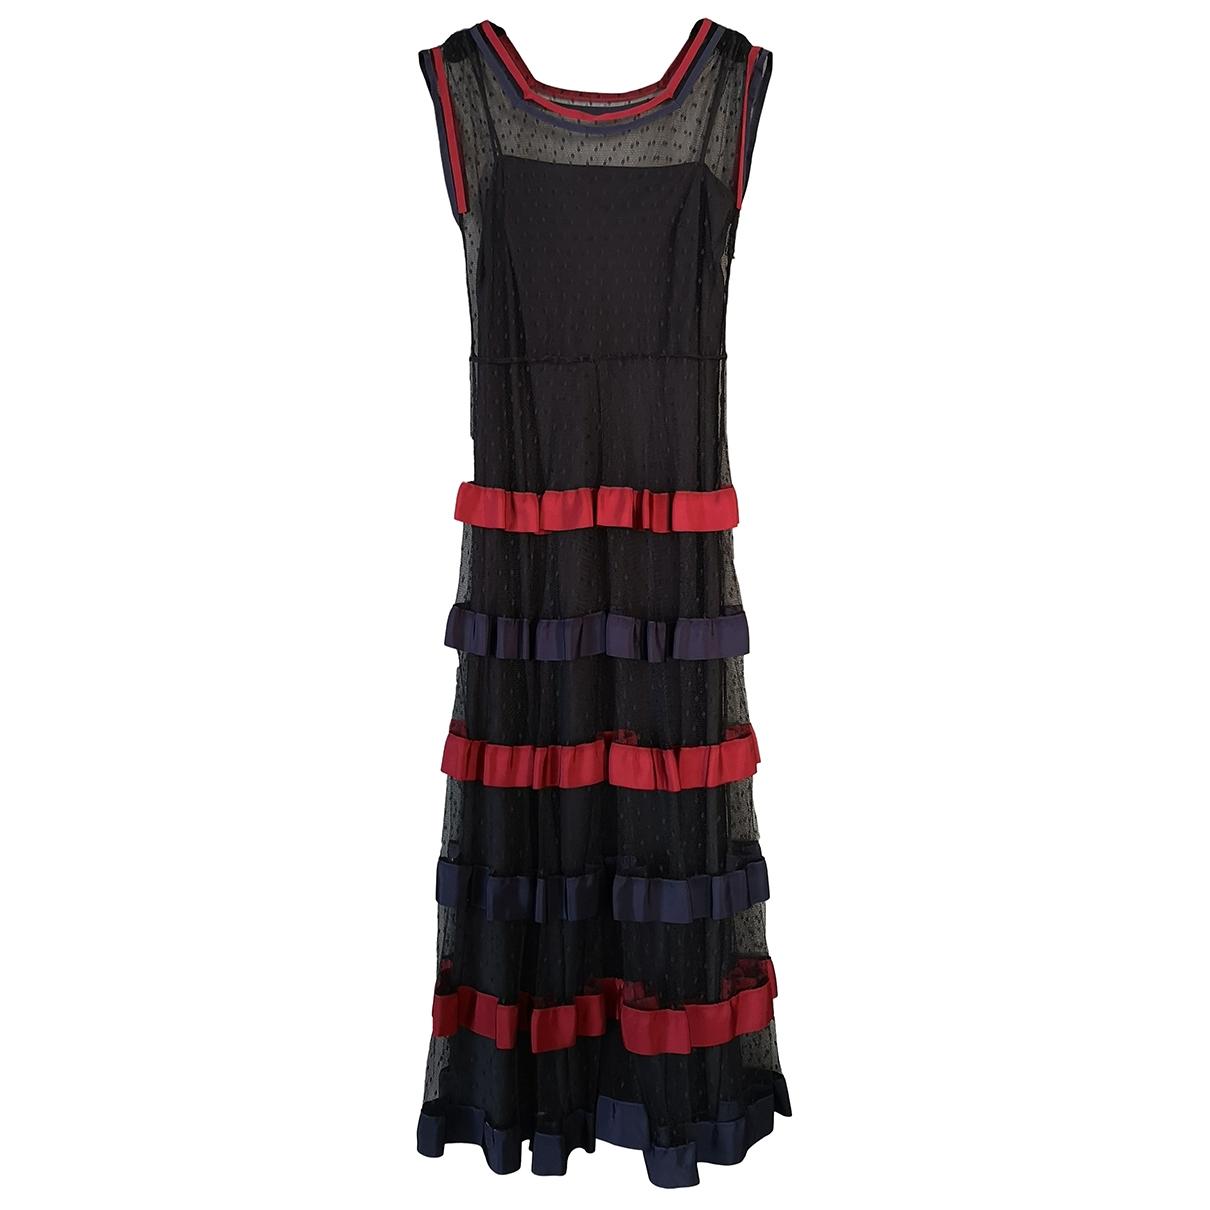 Red Valentino Garavani \N Multicolour dress for Women 44 IT